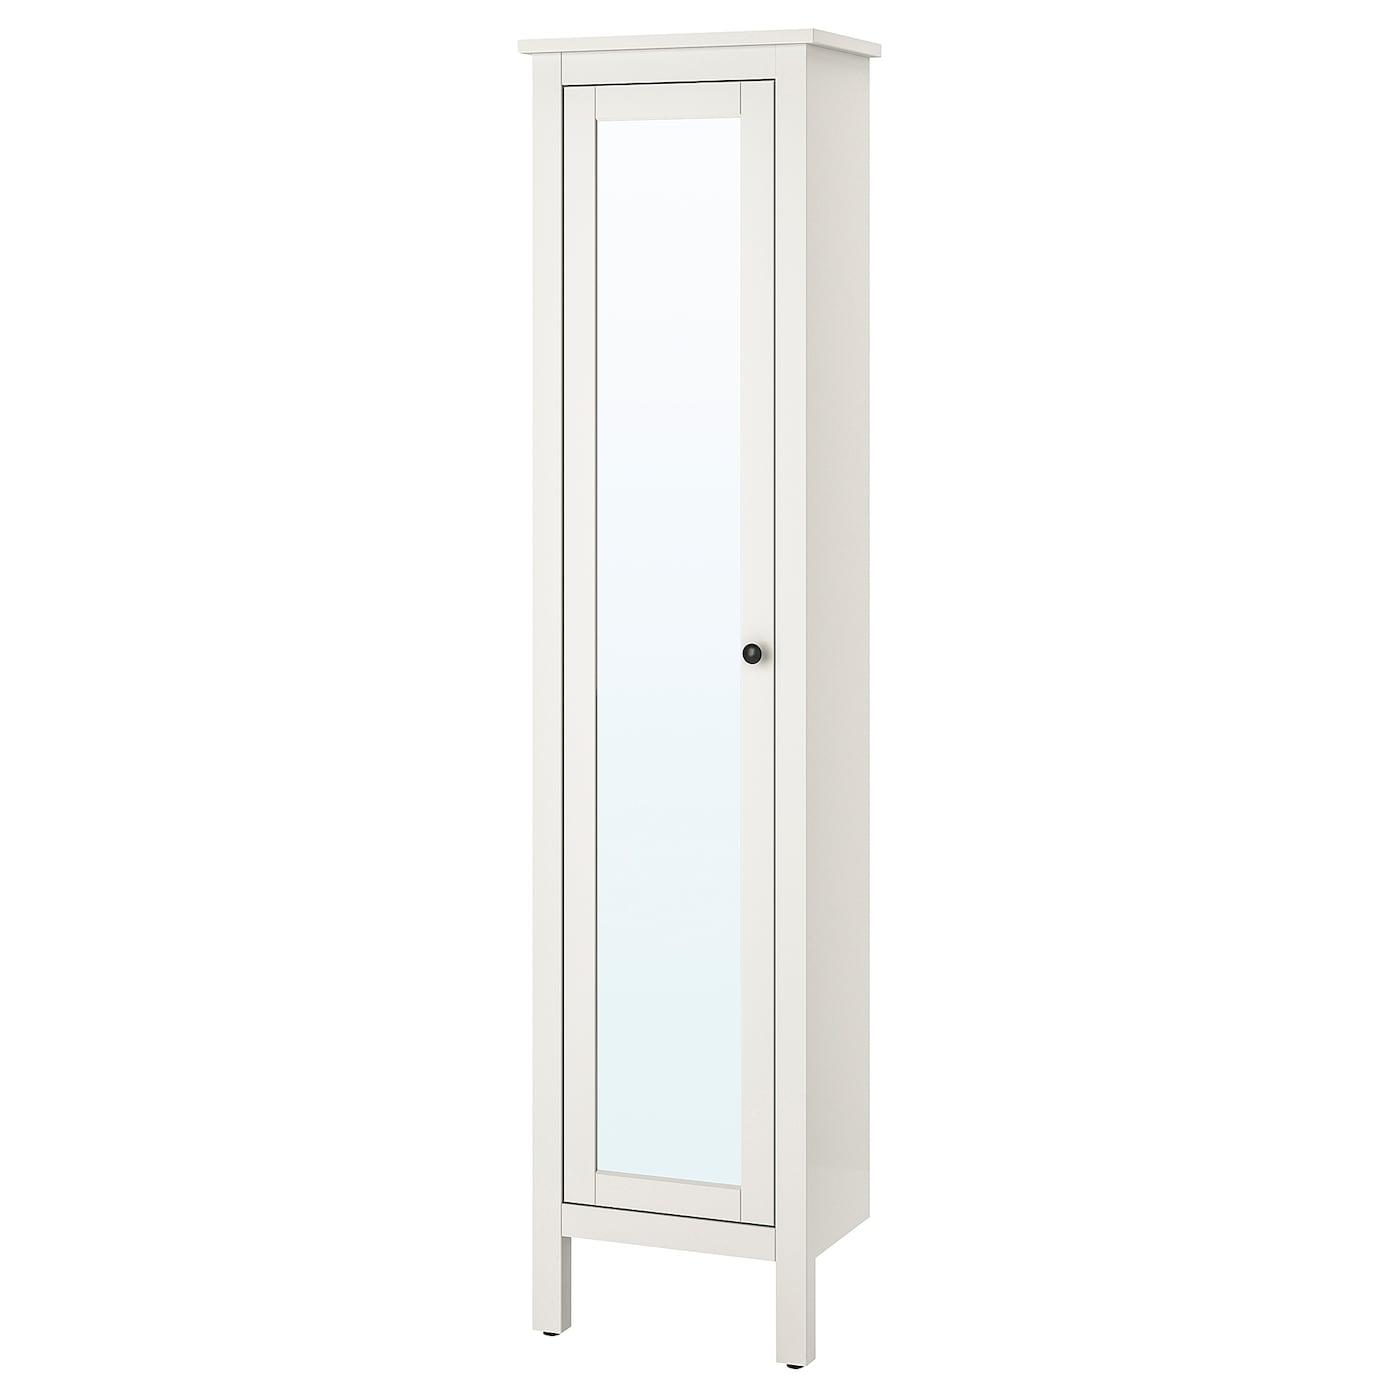 Bathroom Storage & Bathroom Storage Ideas